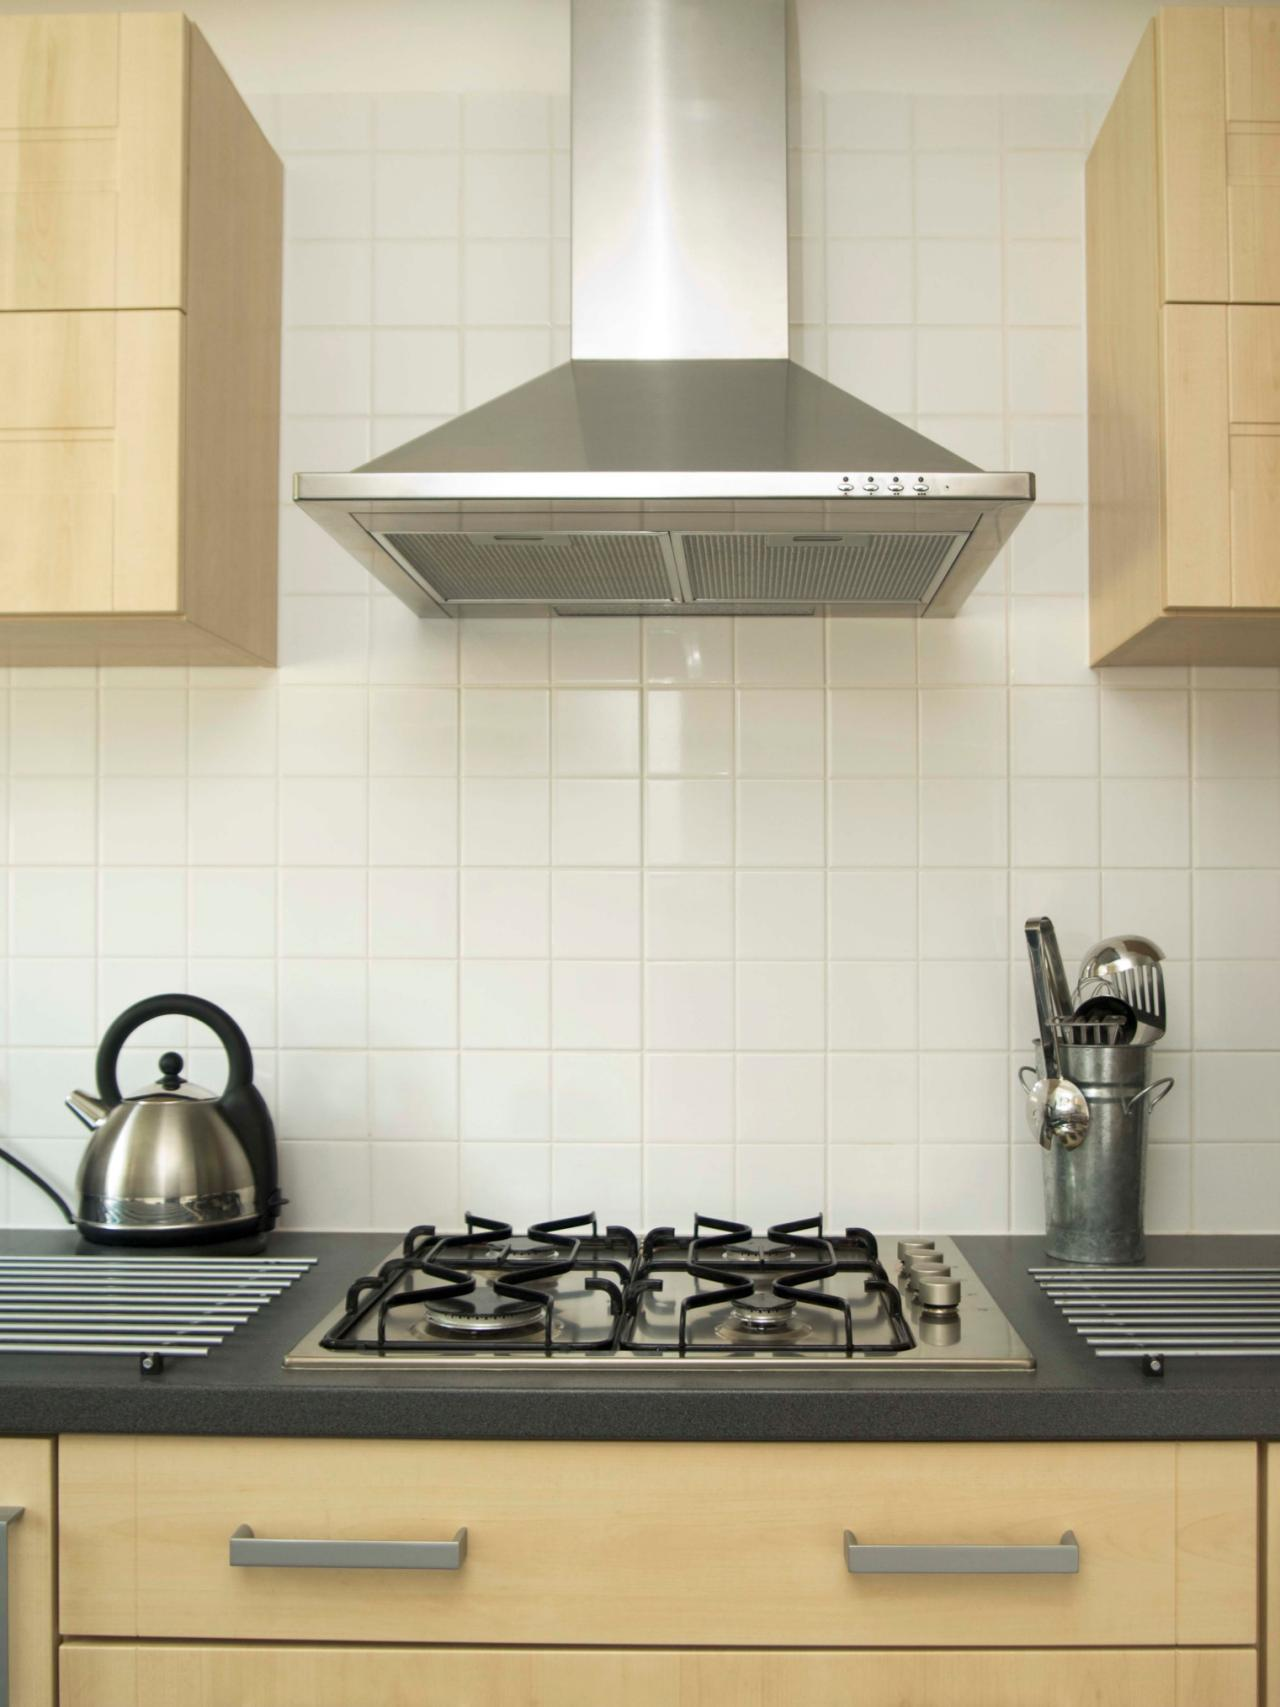 Fan for kitchen exhaust - Ts 86515852_modern Kitchen_s3x4 Kitchen Exhaust Fans